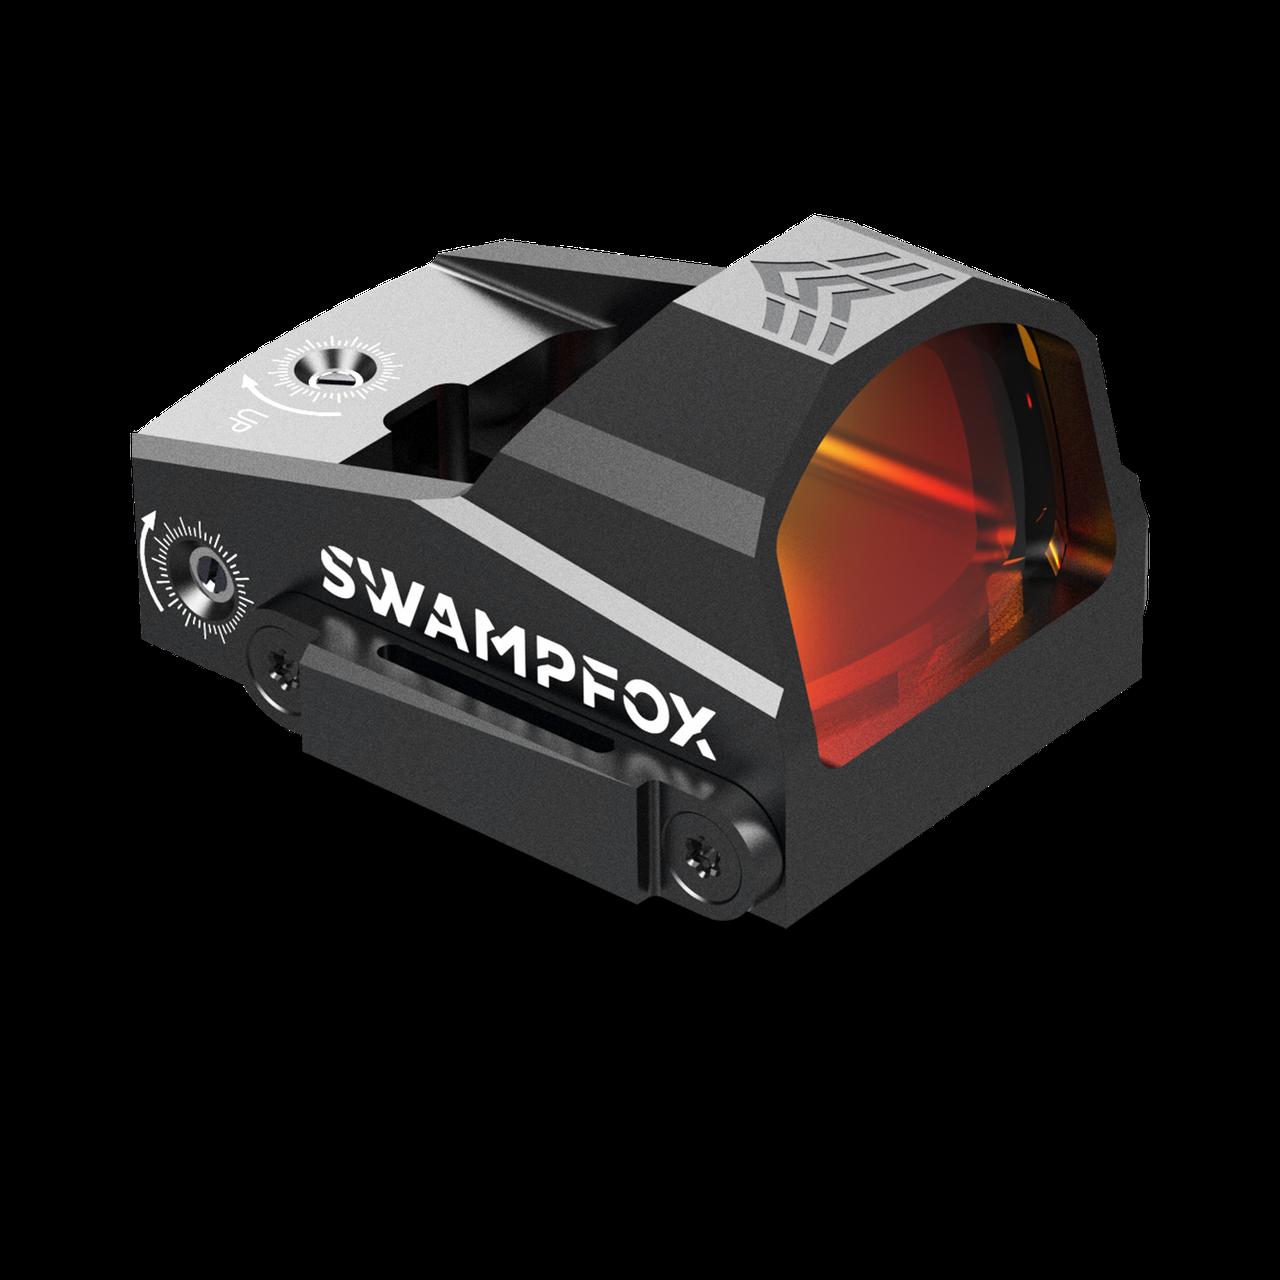 SwampFox RMR Optic KINGSLAYER 1x22 3MOA MICRO REFLEX DOT SIGHT